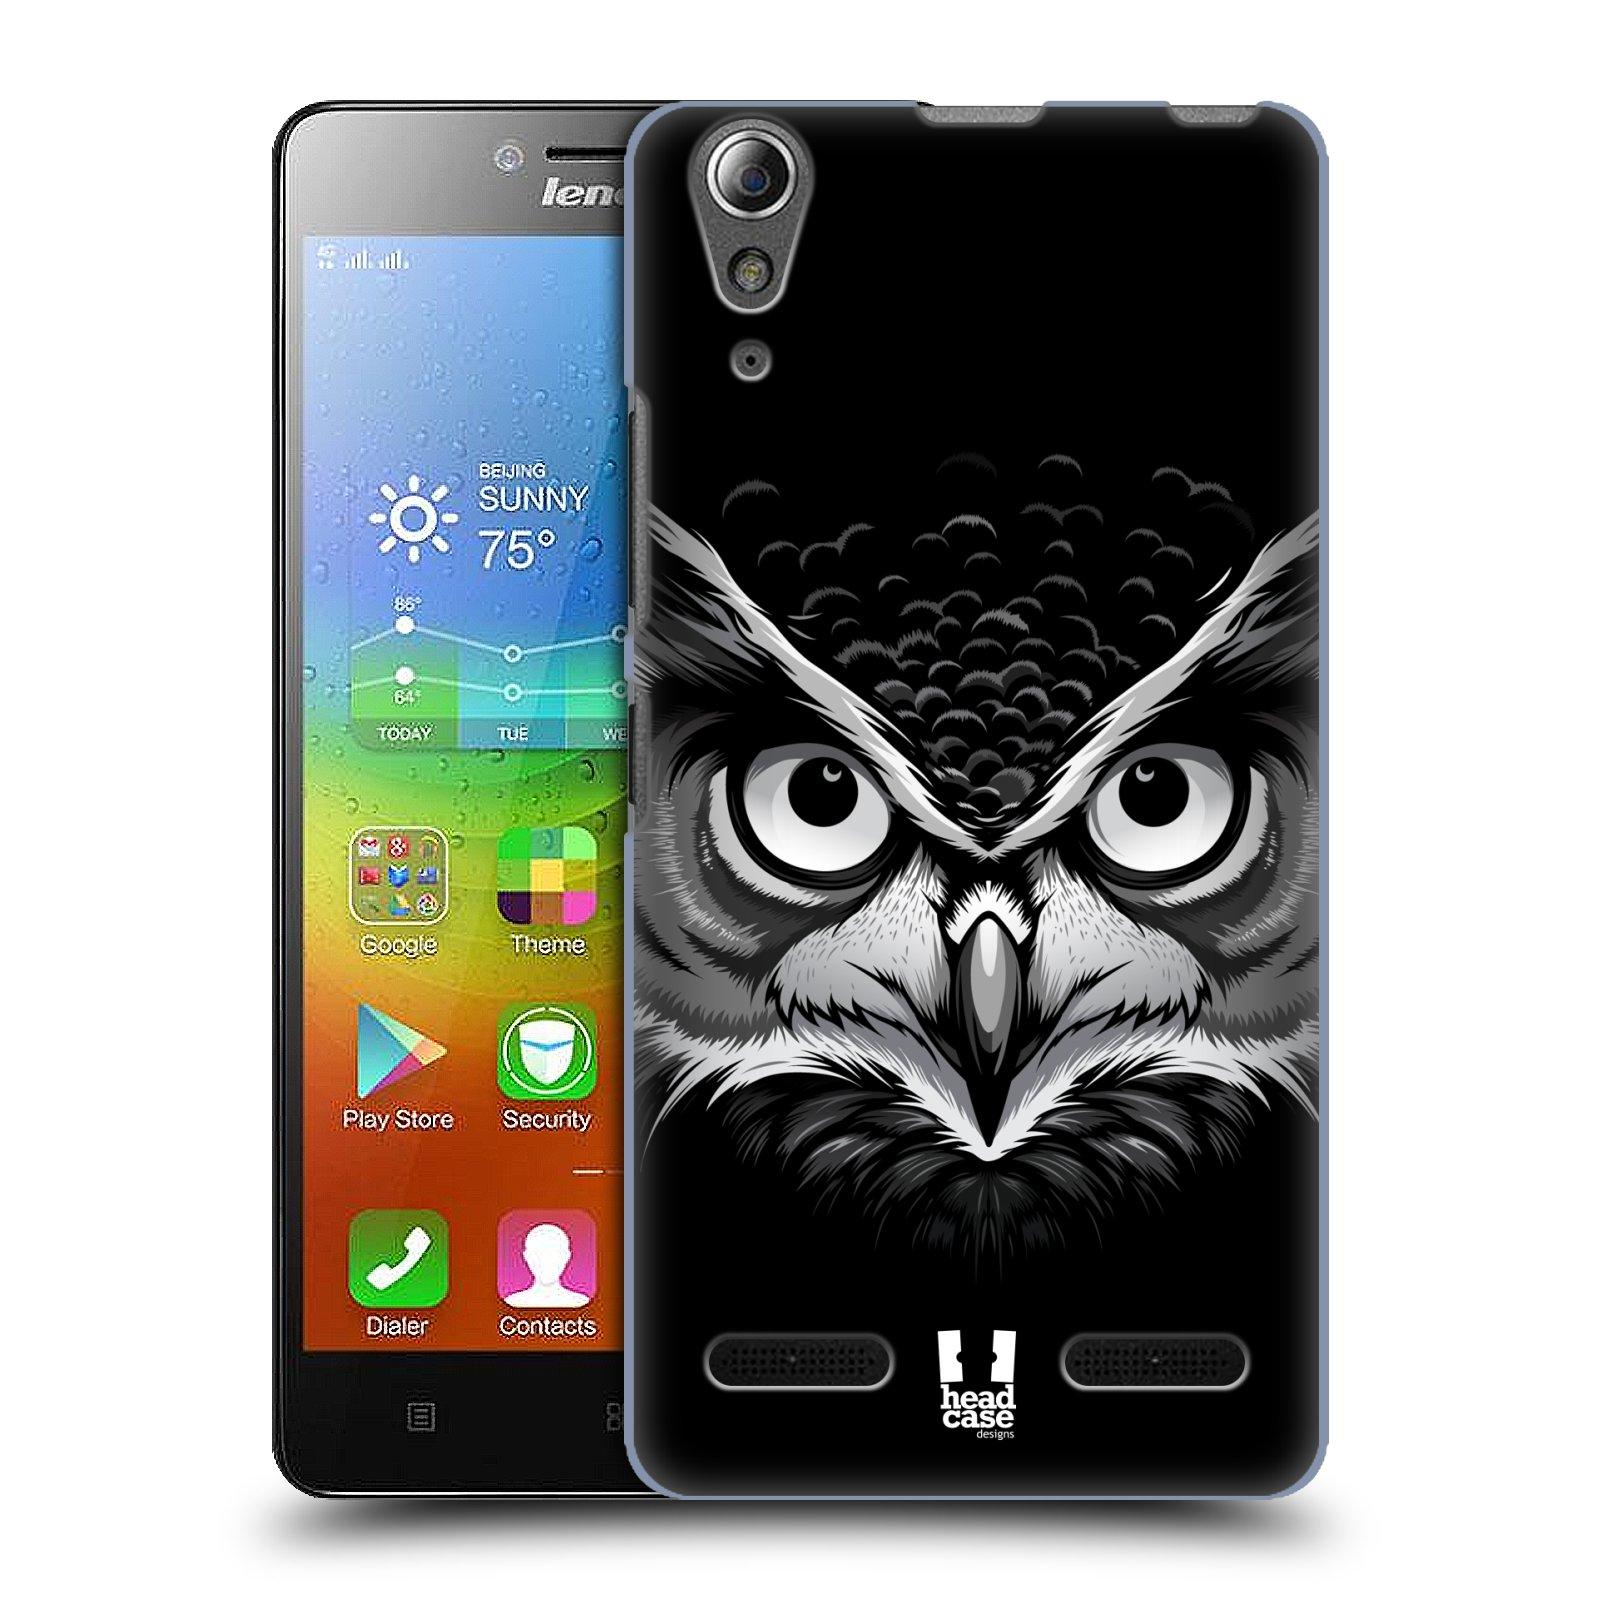 HEAD CASE pevný plastový obal na mobil LENOVO A6000 / A6000 PLUS vzor Zvíře kreslená tvář 2 sova